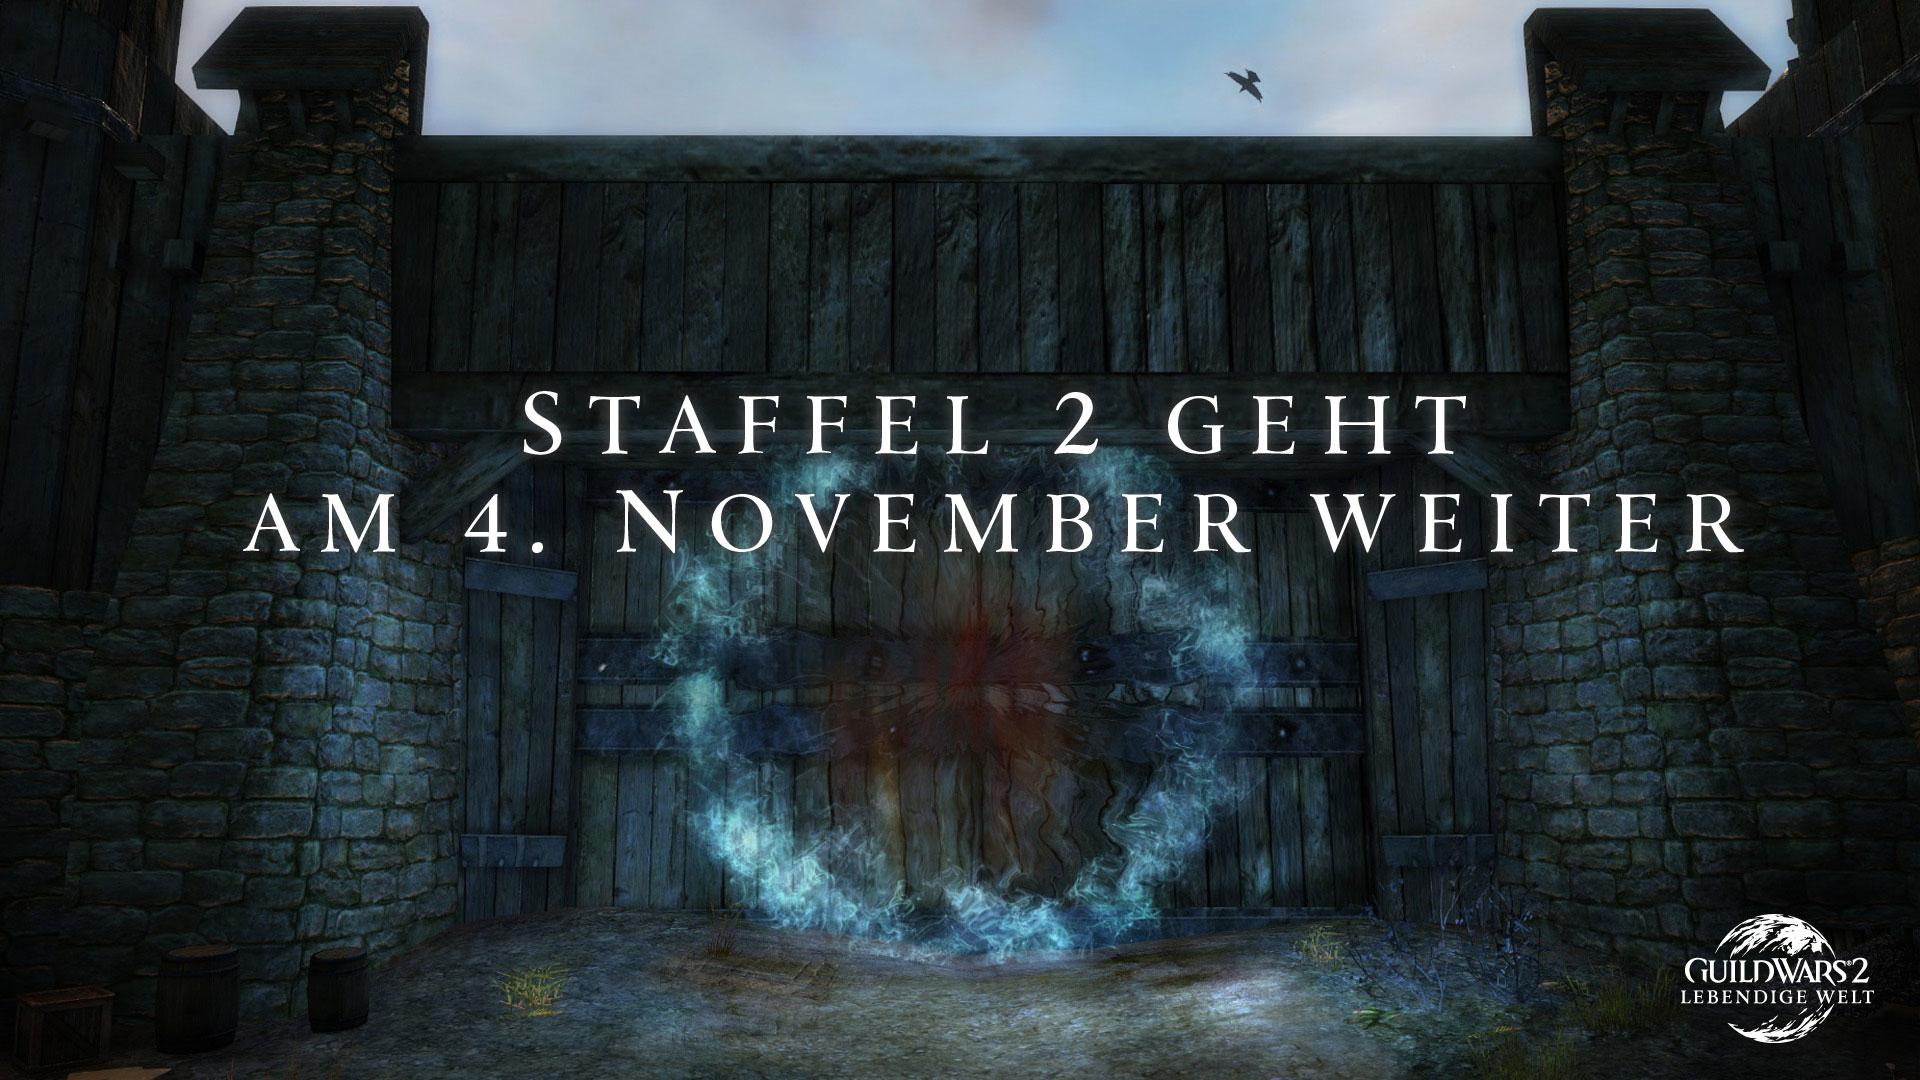 Guild Wars 2: Lebendige Welt geht am 4. November weiter